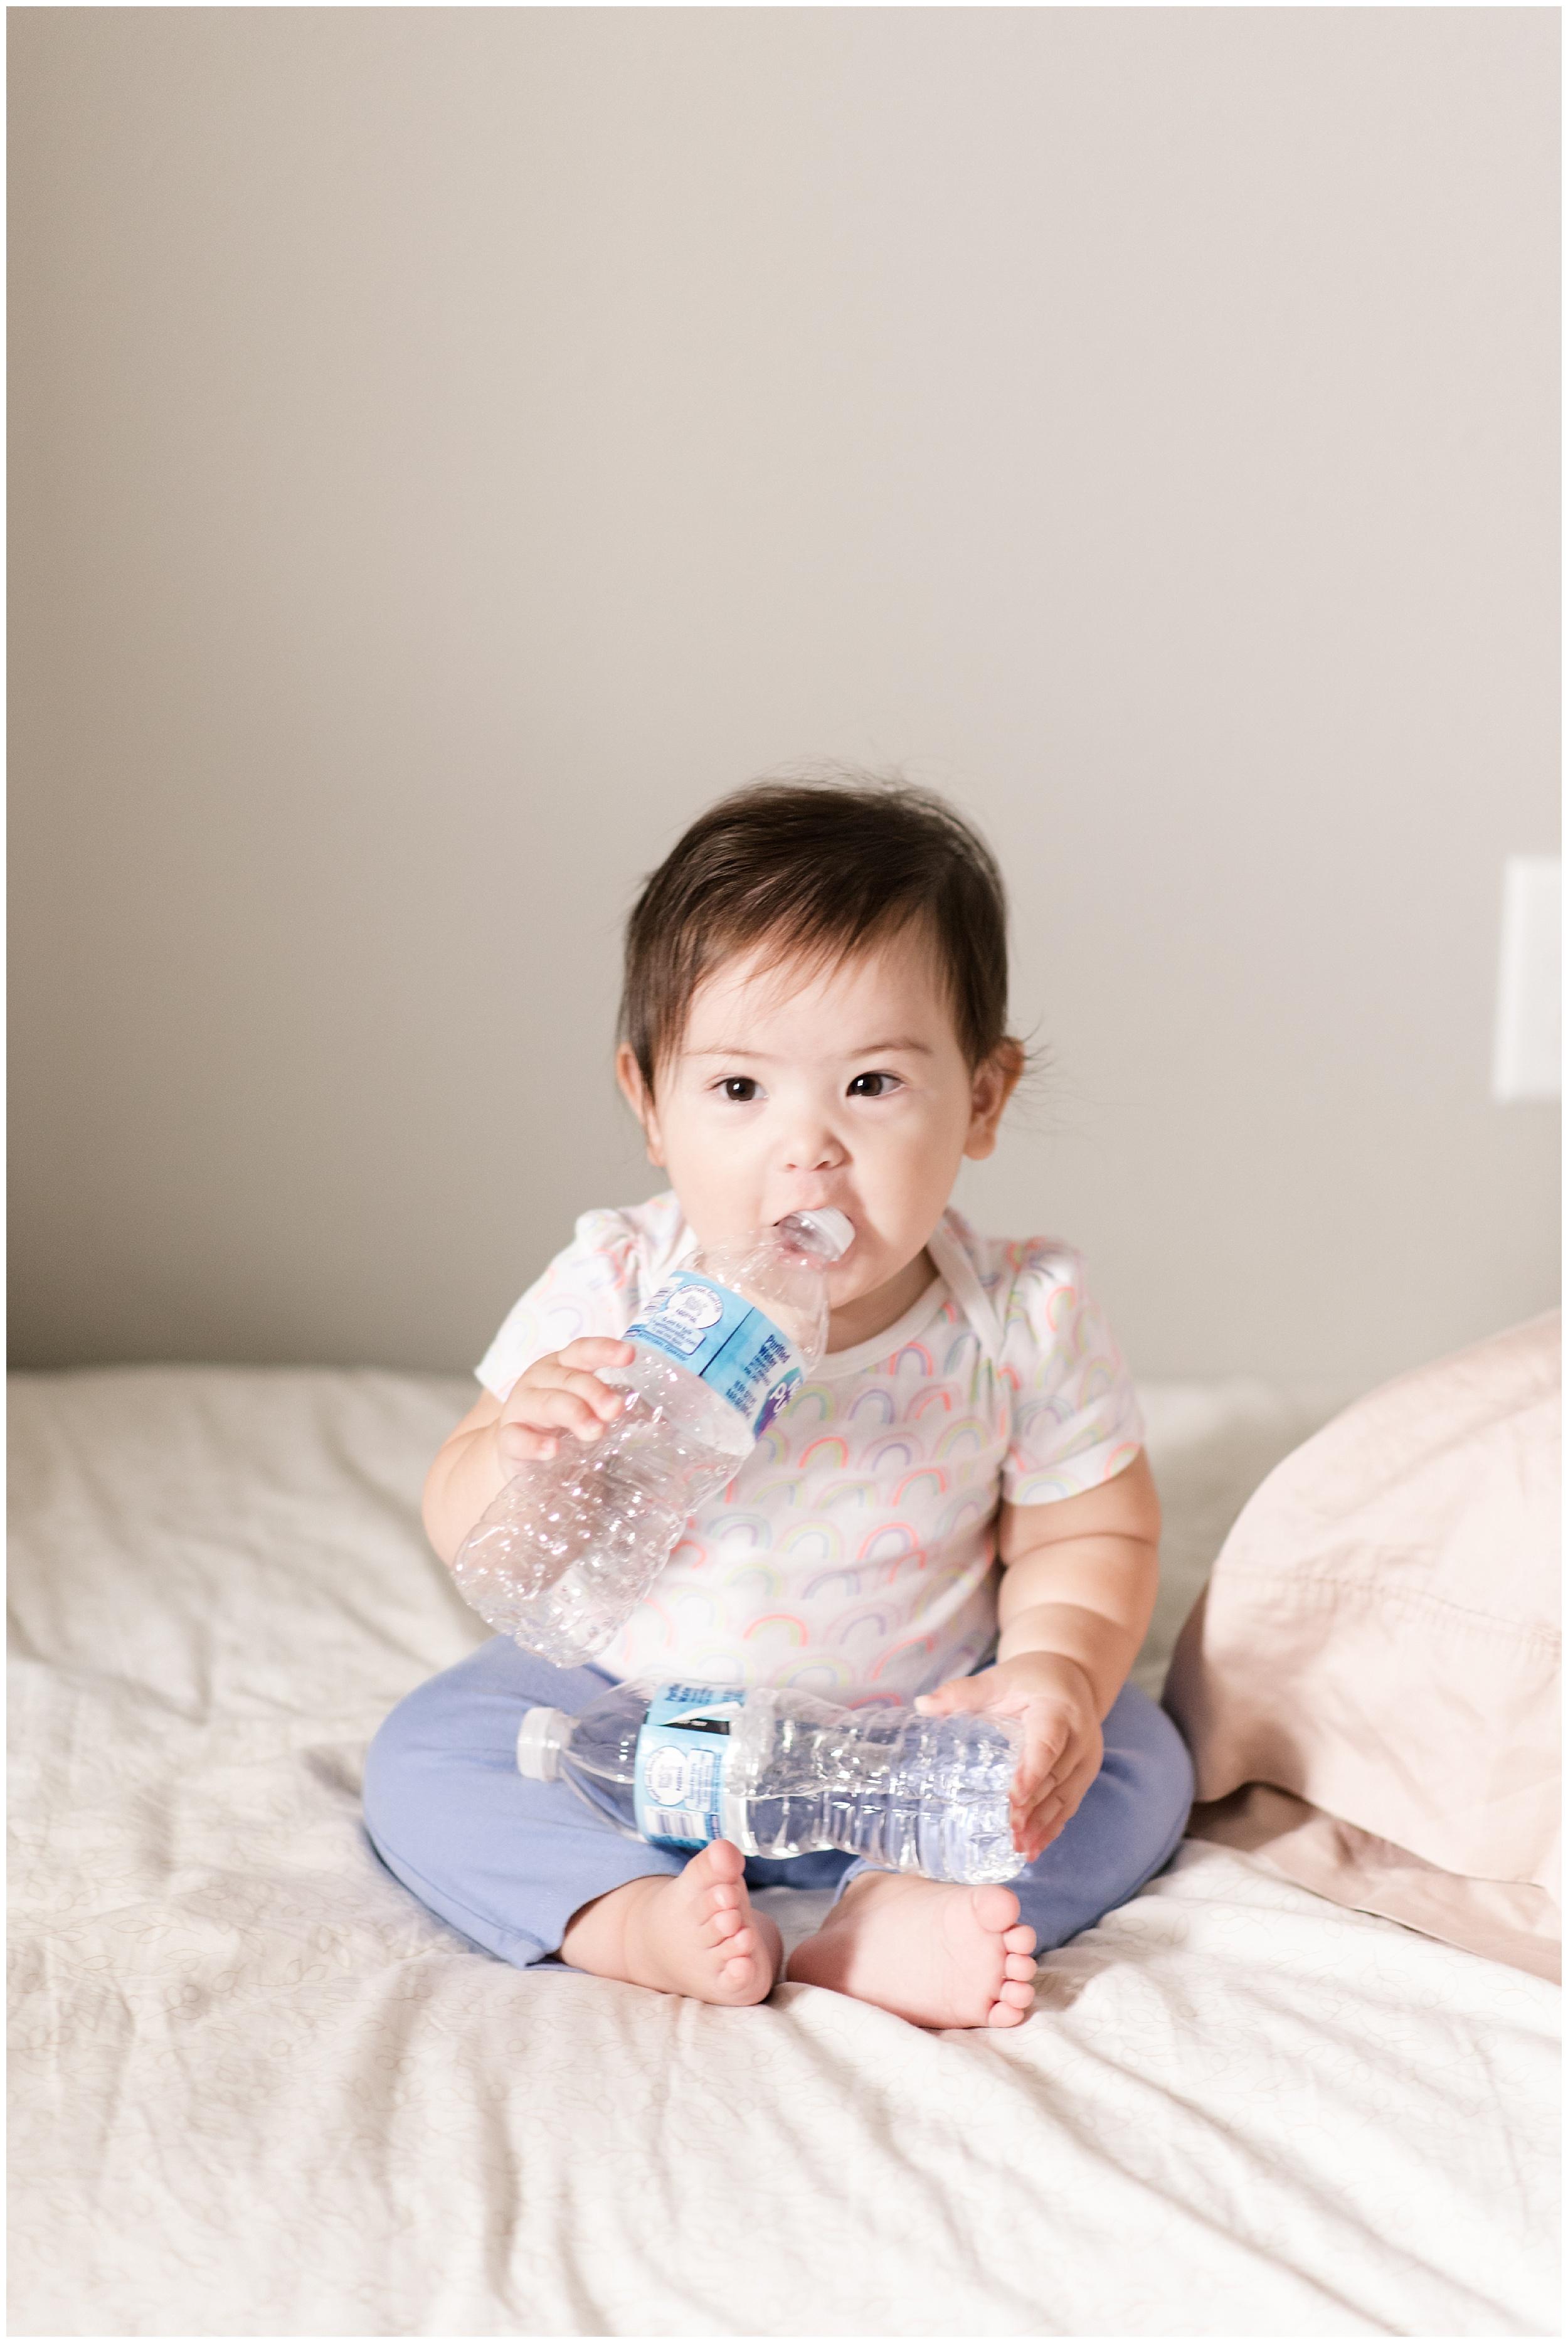 milwaukee-mom-photographer-9-month-old-photography_0017.jpg